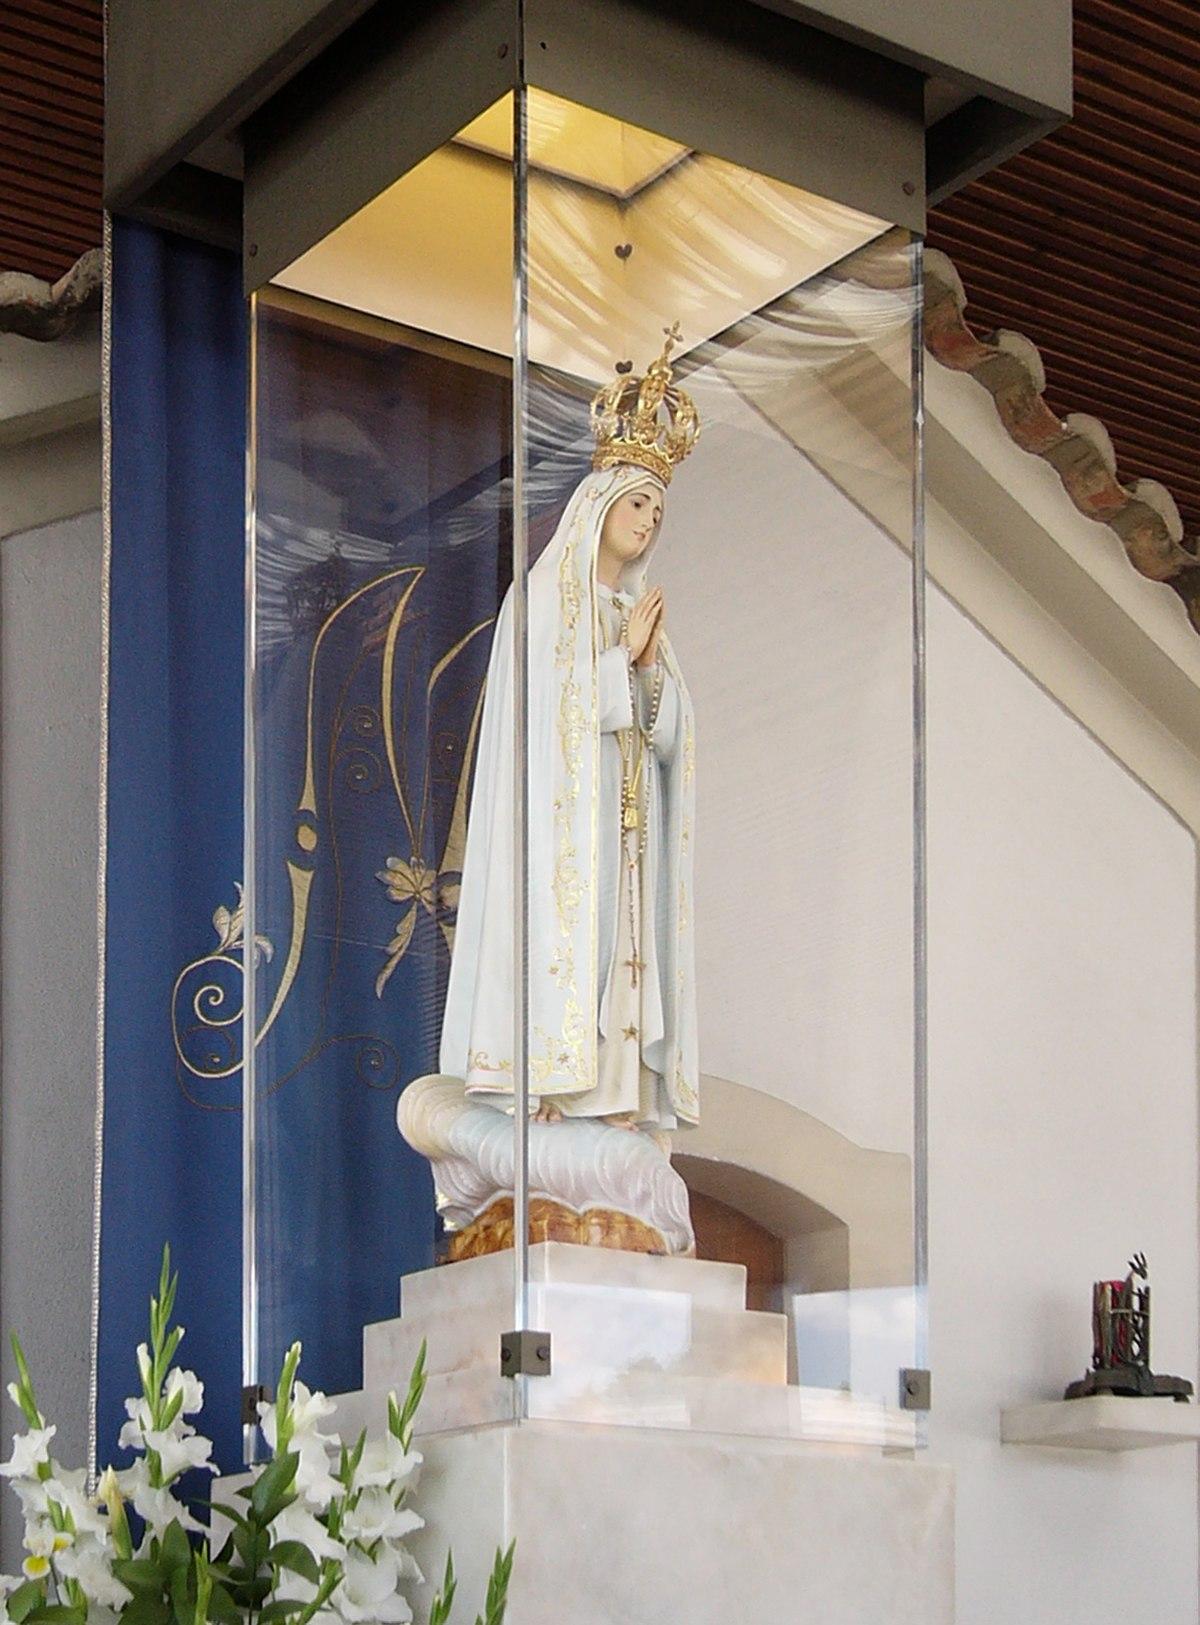 Virgen de f tima wikipedia la enciclopedia libre for Ministerio del interior donde queda